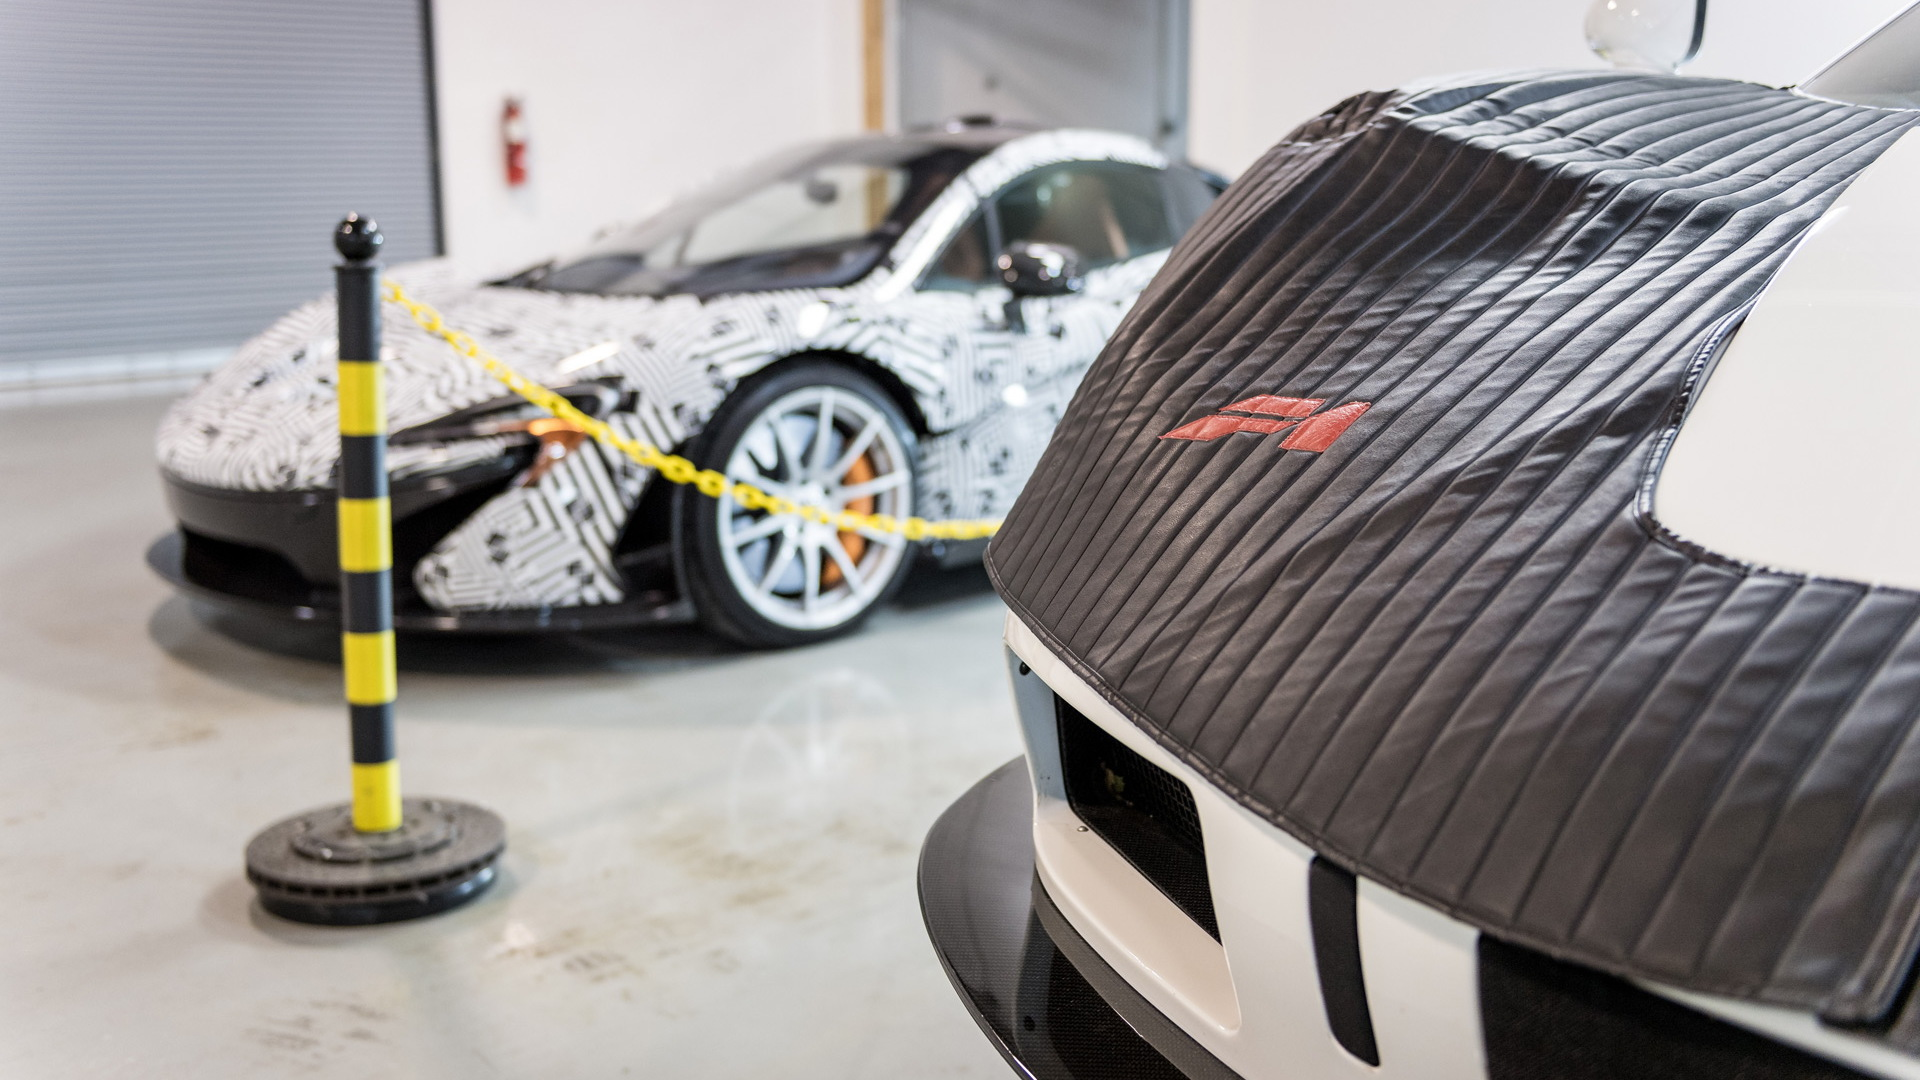 North American McLaren F1 Service Center in Pennsylvania